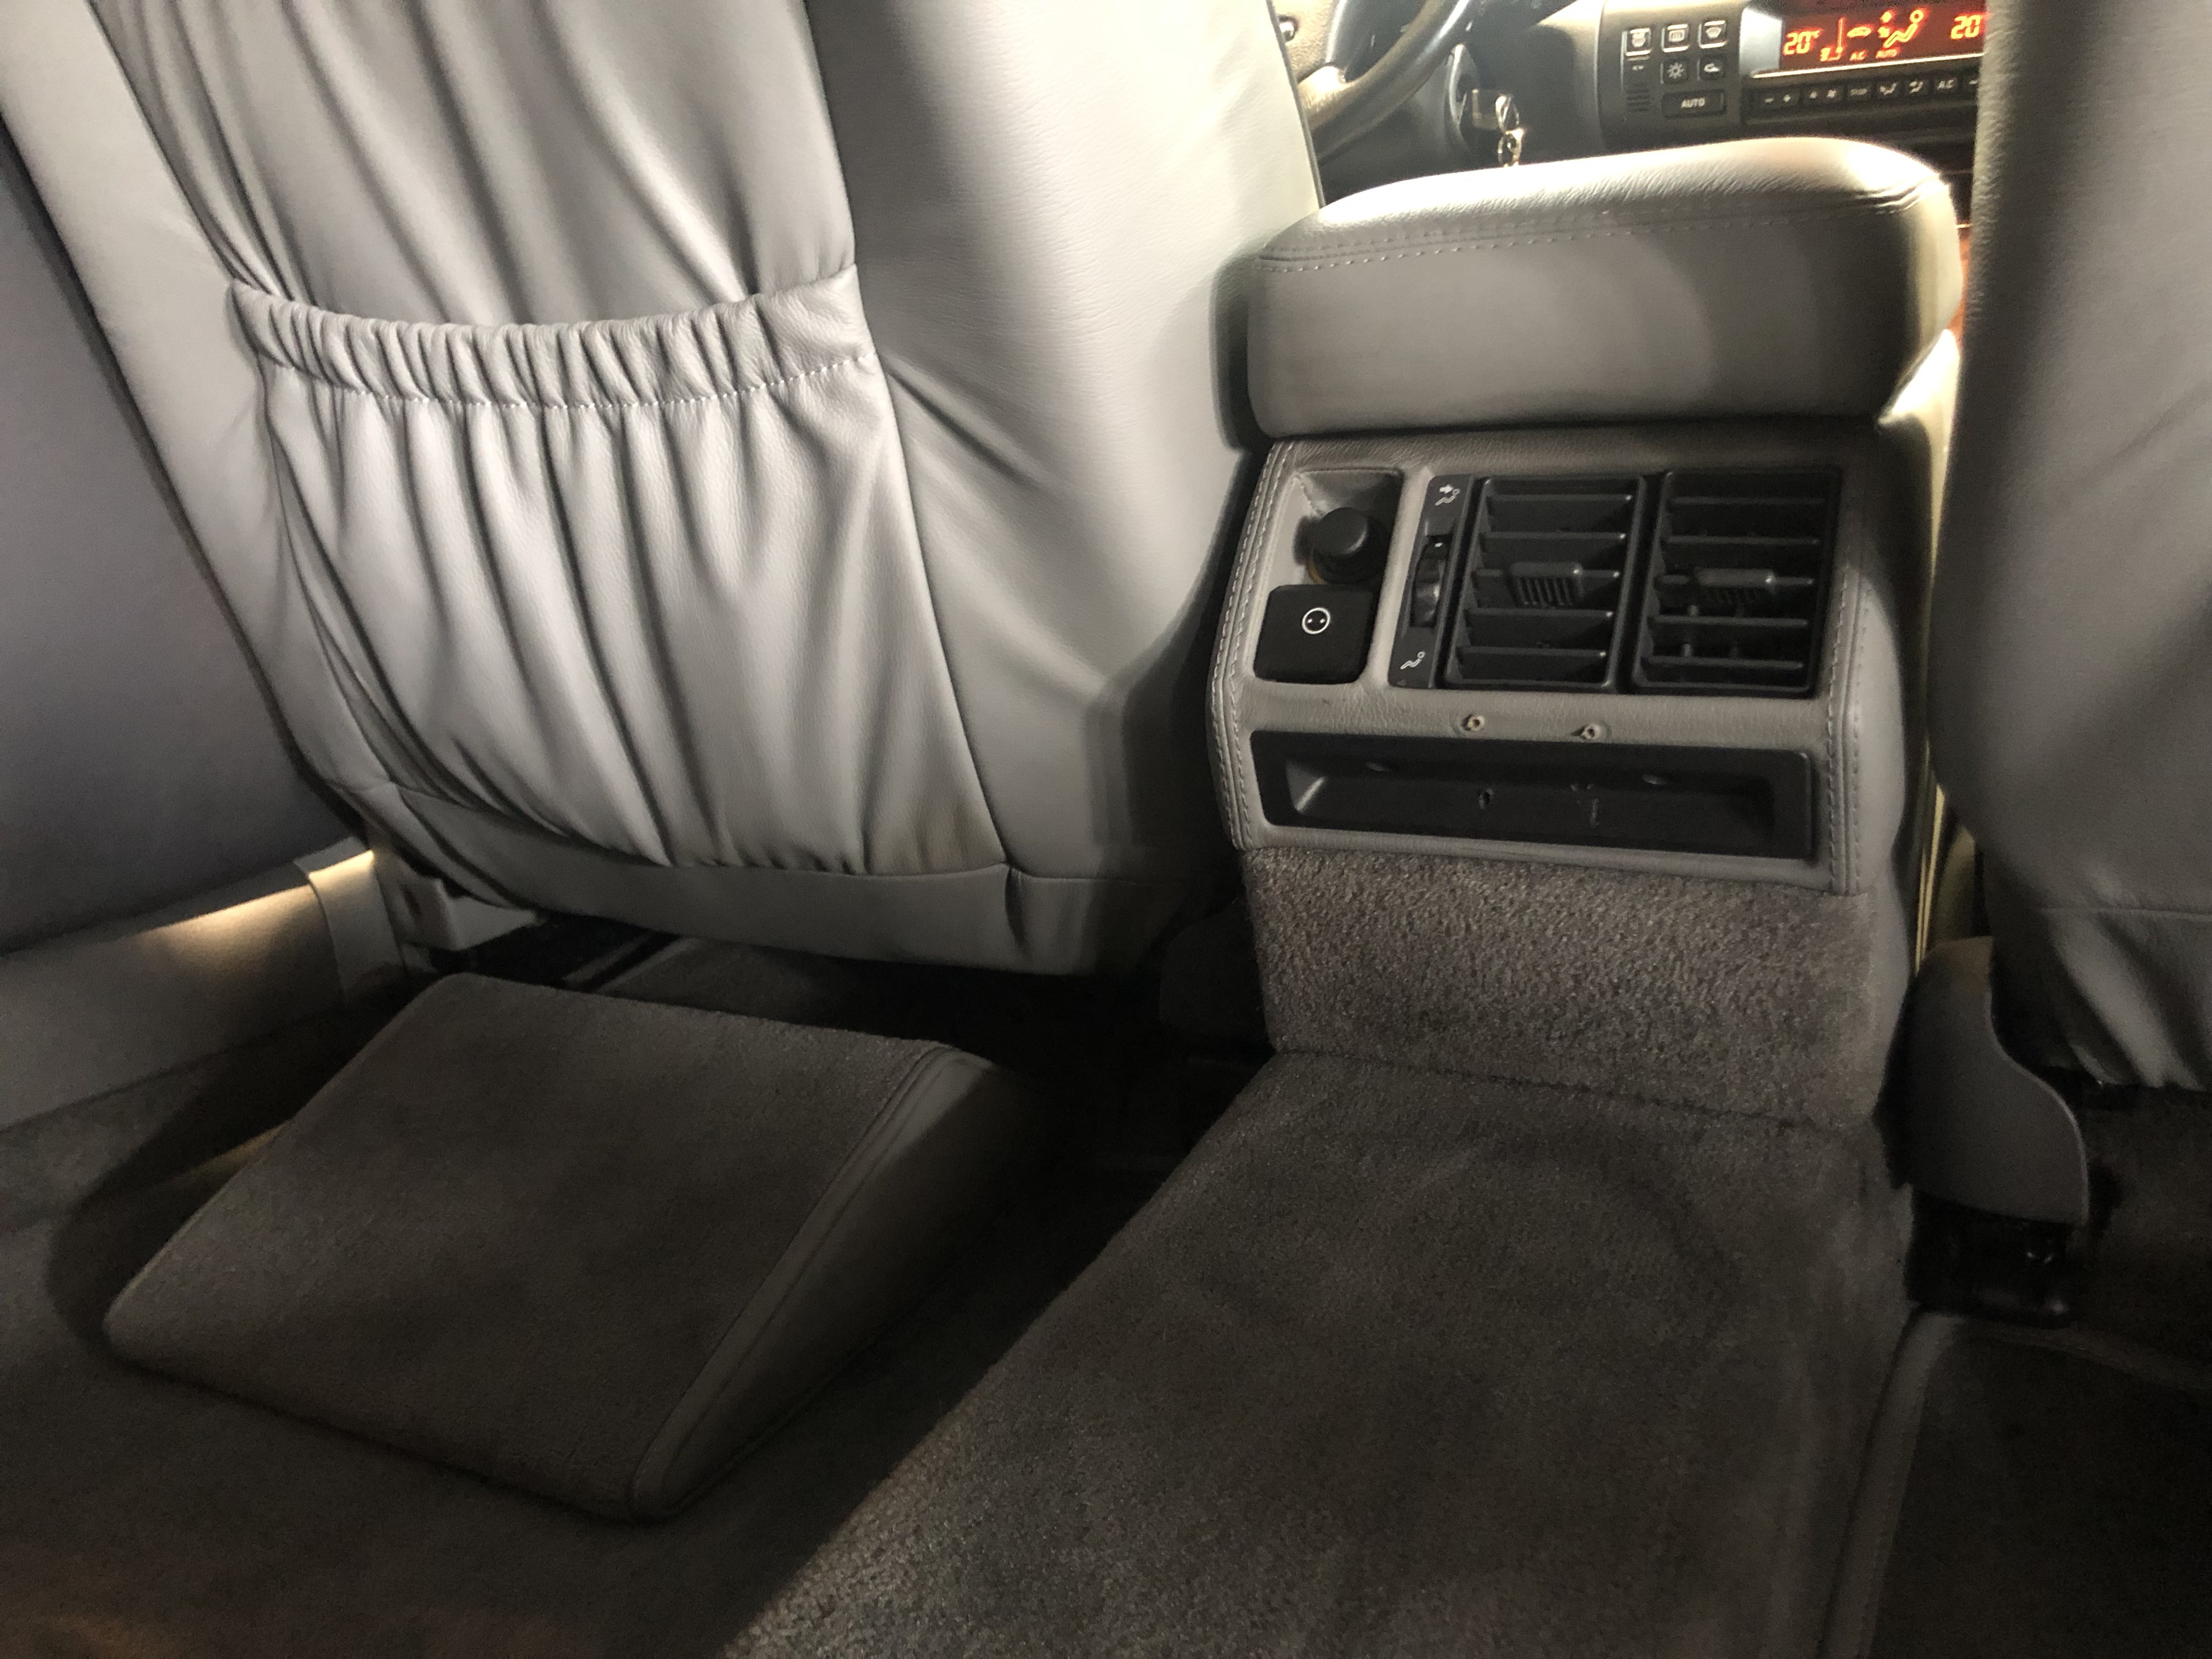 Renault Safrane Initiale Paris 2.5 Limousine